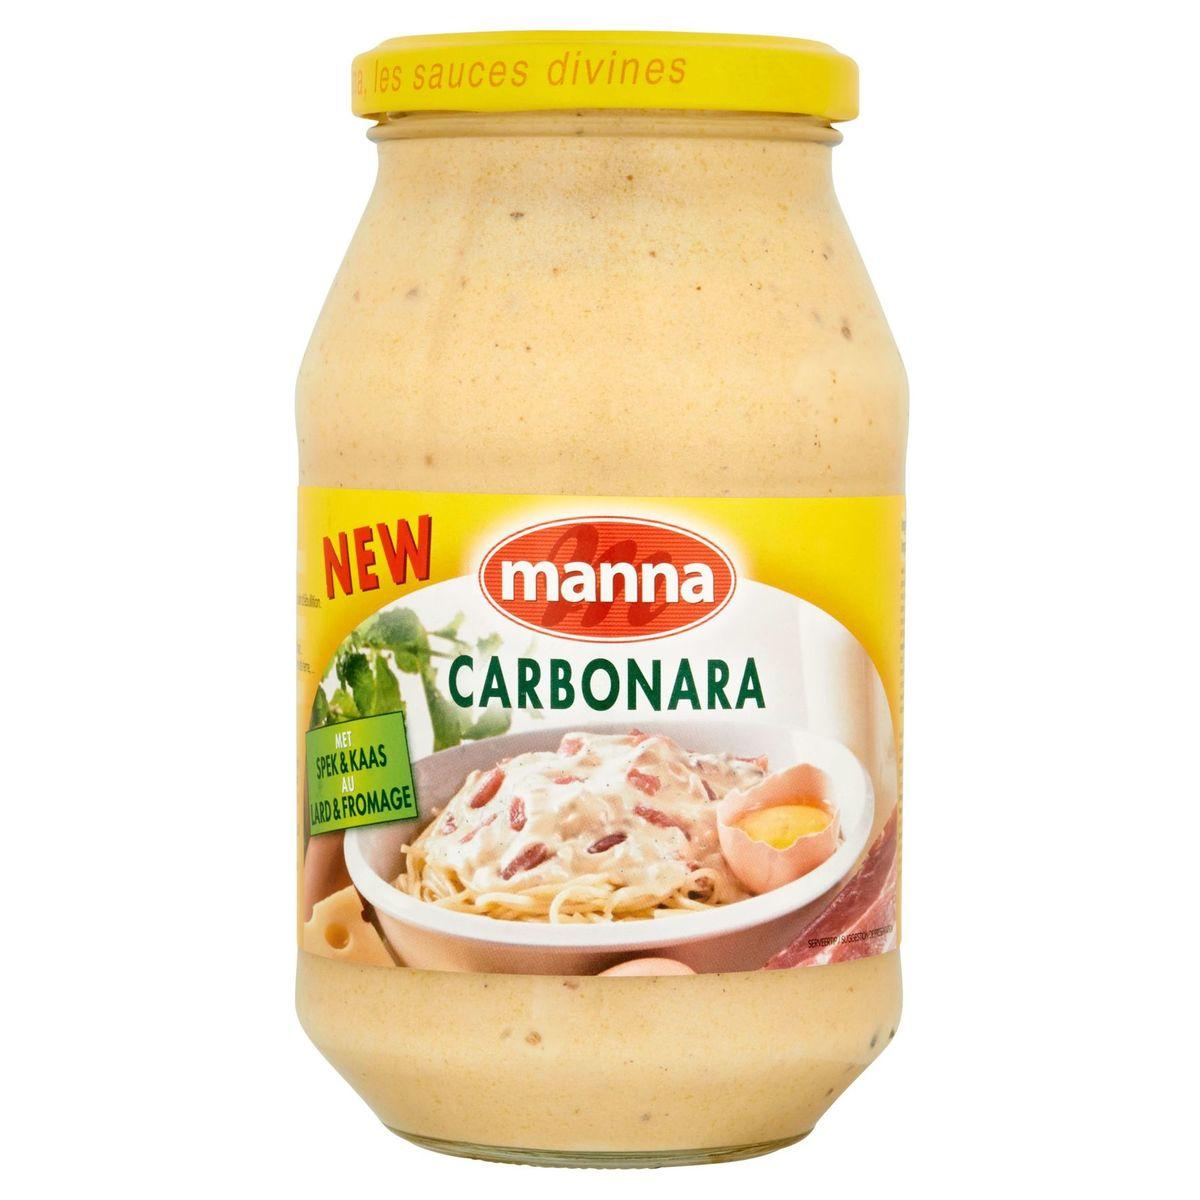 Manna Carbonara au Lard & Fromage 500 g